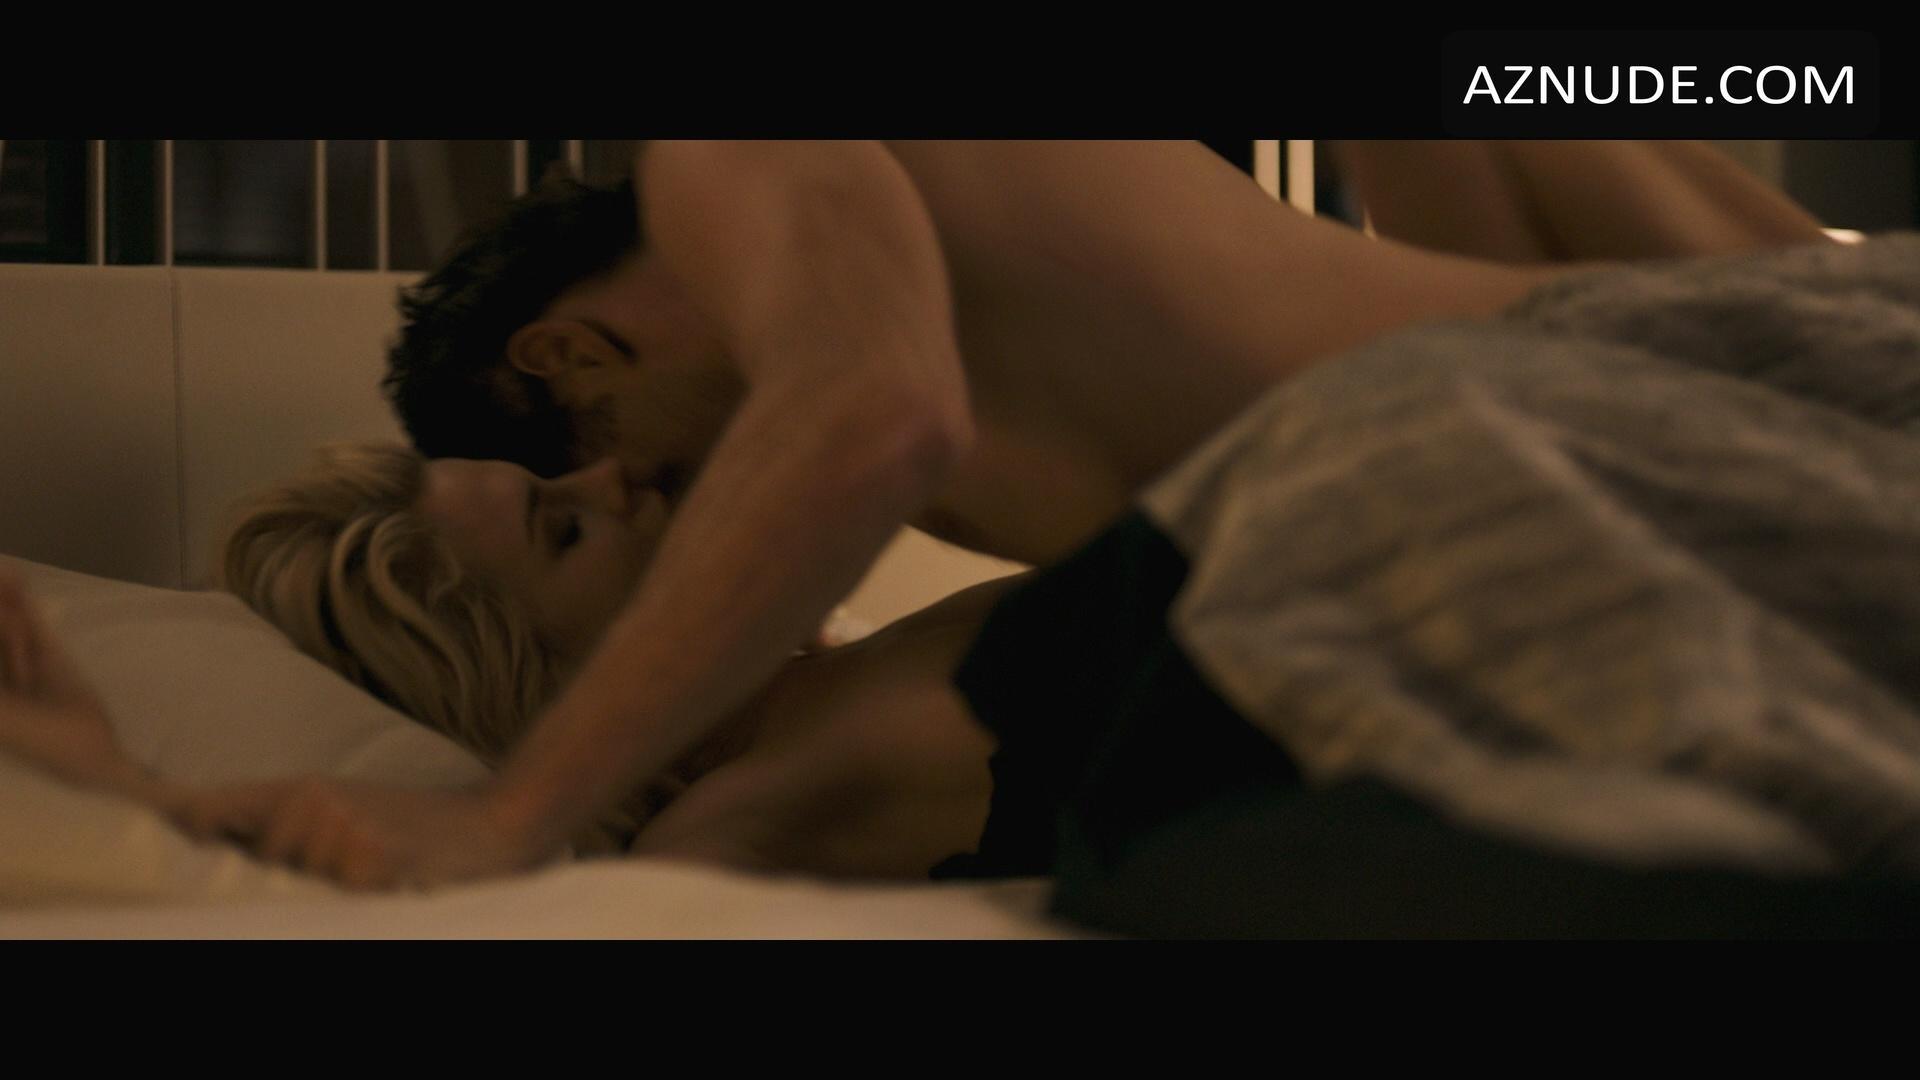 Sexybeach Teens James Marsden Hot Naked